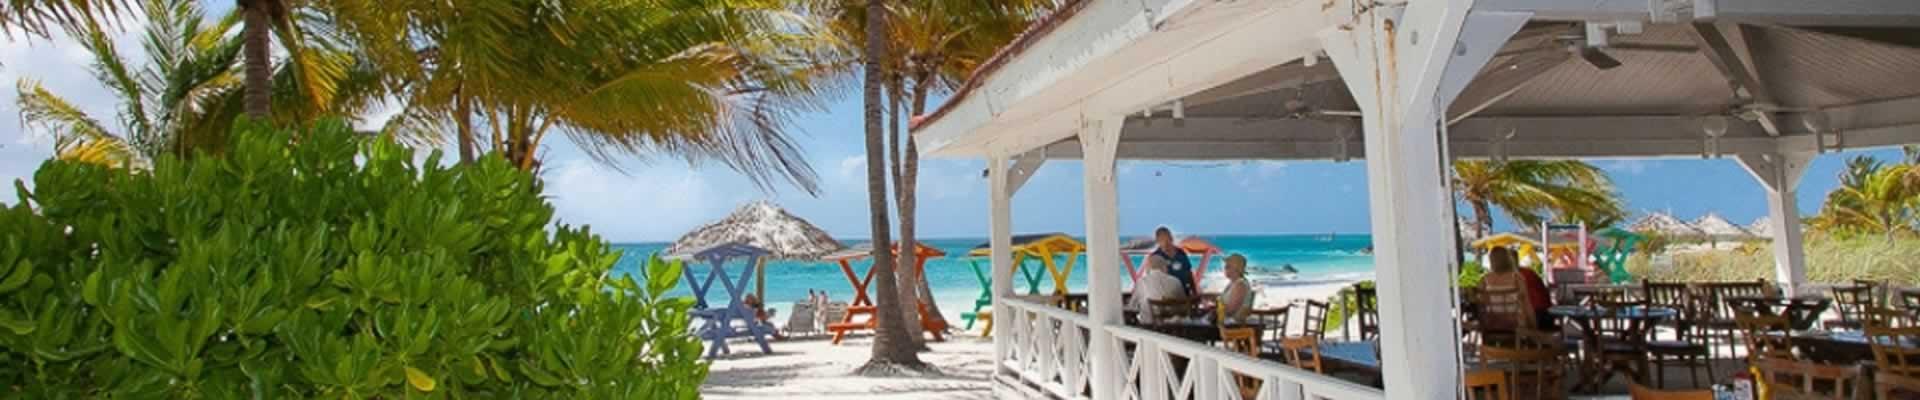 Taino Beach Resorts Bahamas